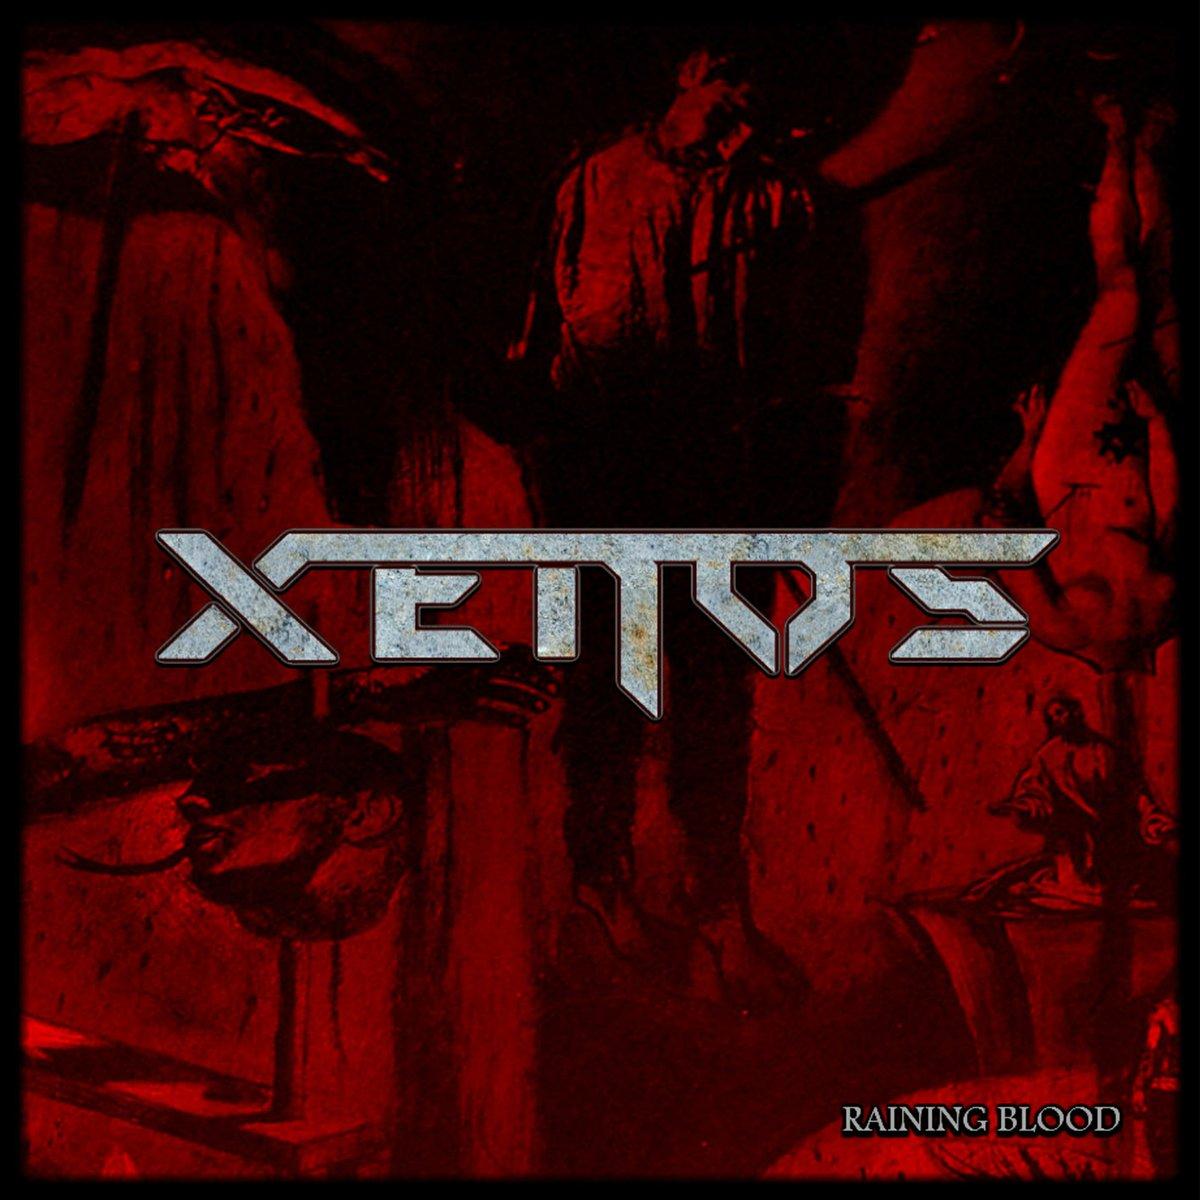 "XENOS: coverizzano ""Raining Blood"" degli SLAYER https://t.co/7ilssbTBE5 #metalwave #XENOS #ClubInferno #SLAYER #mykingdommusic https://t.co/DvIPPOkE5B"